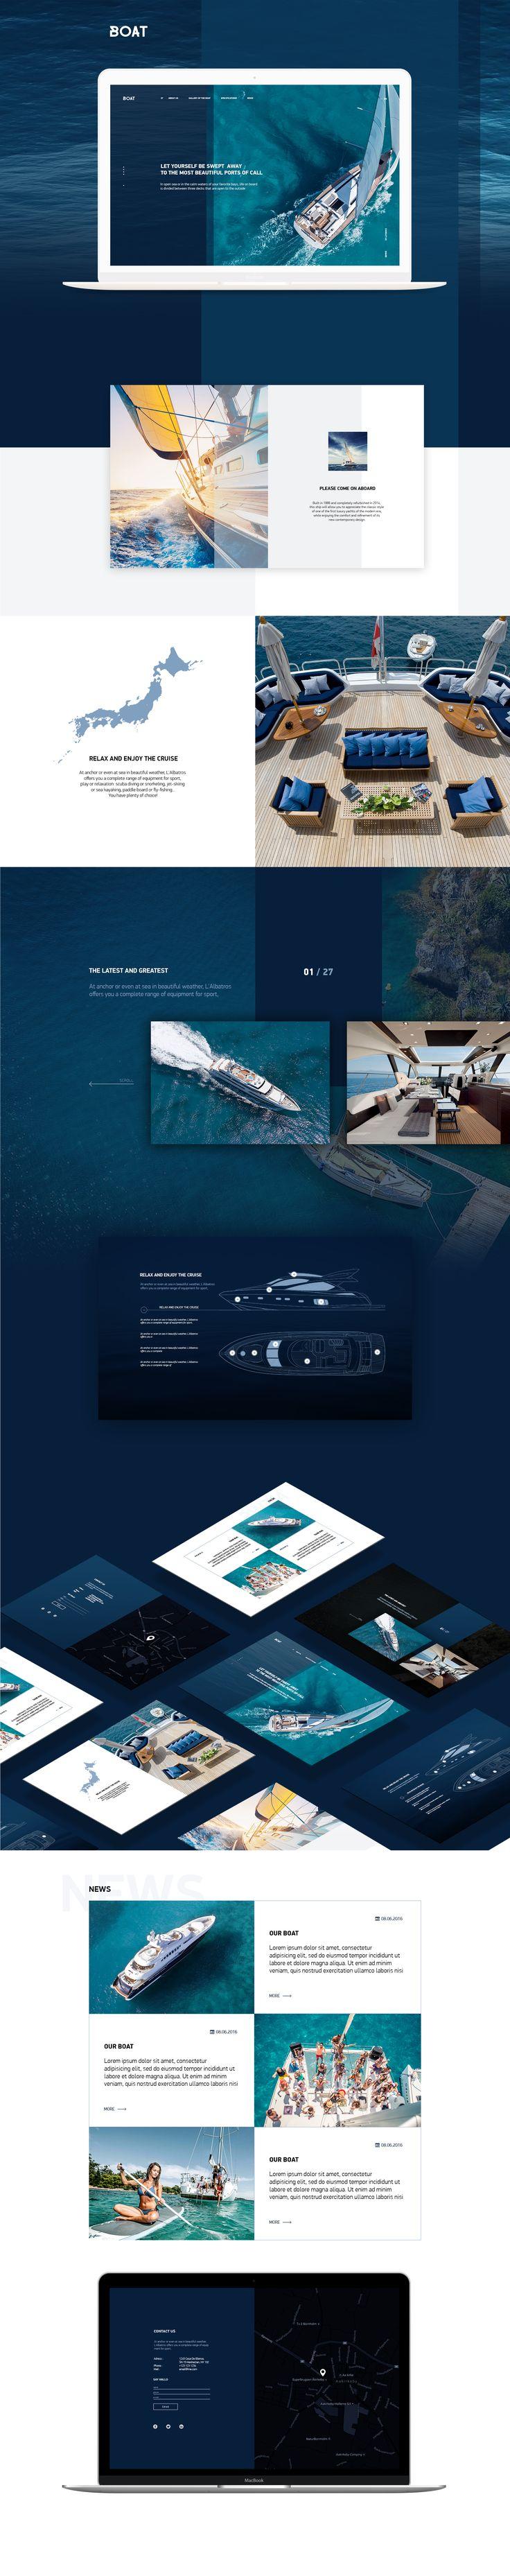 Chillicode Web & Design on Behance